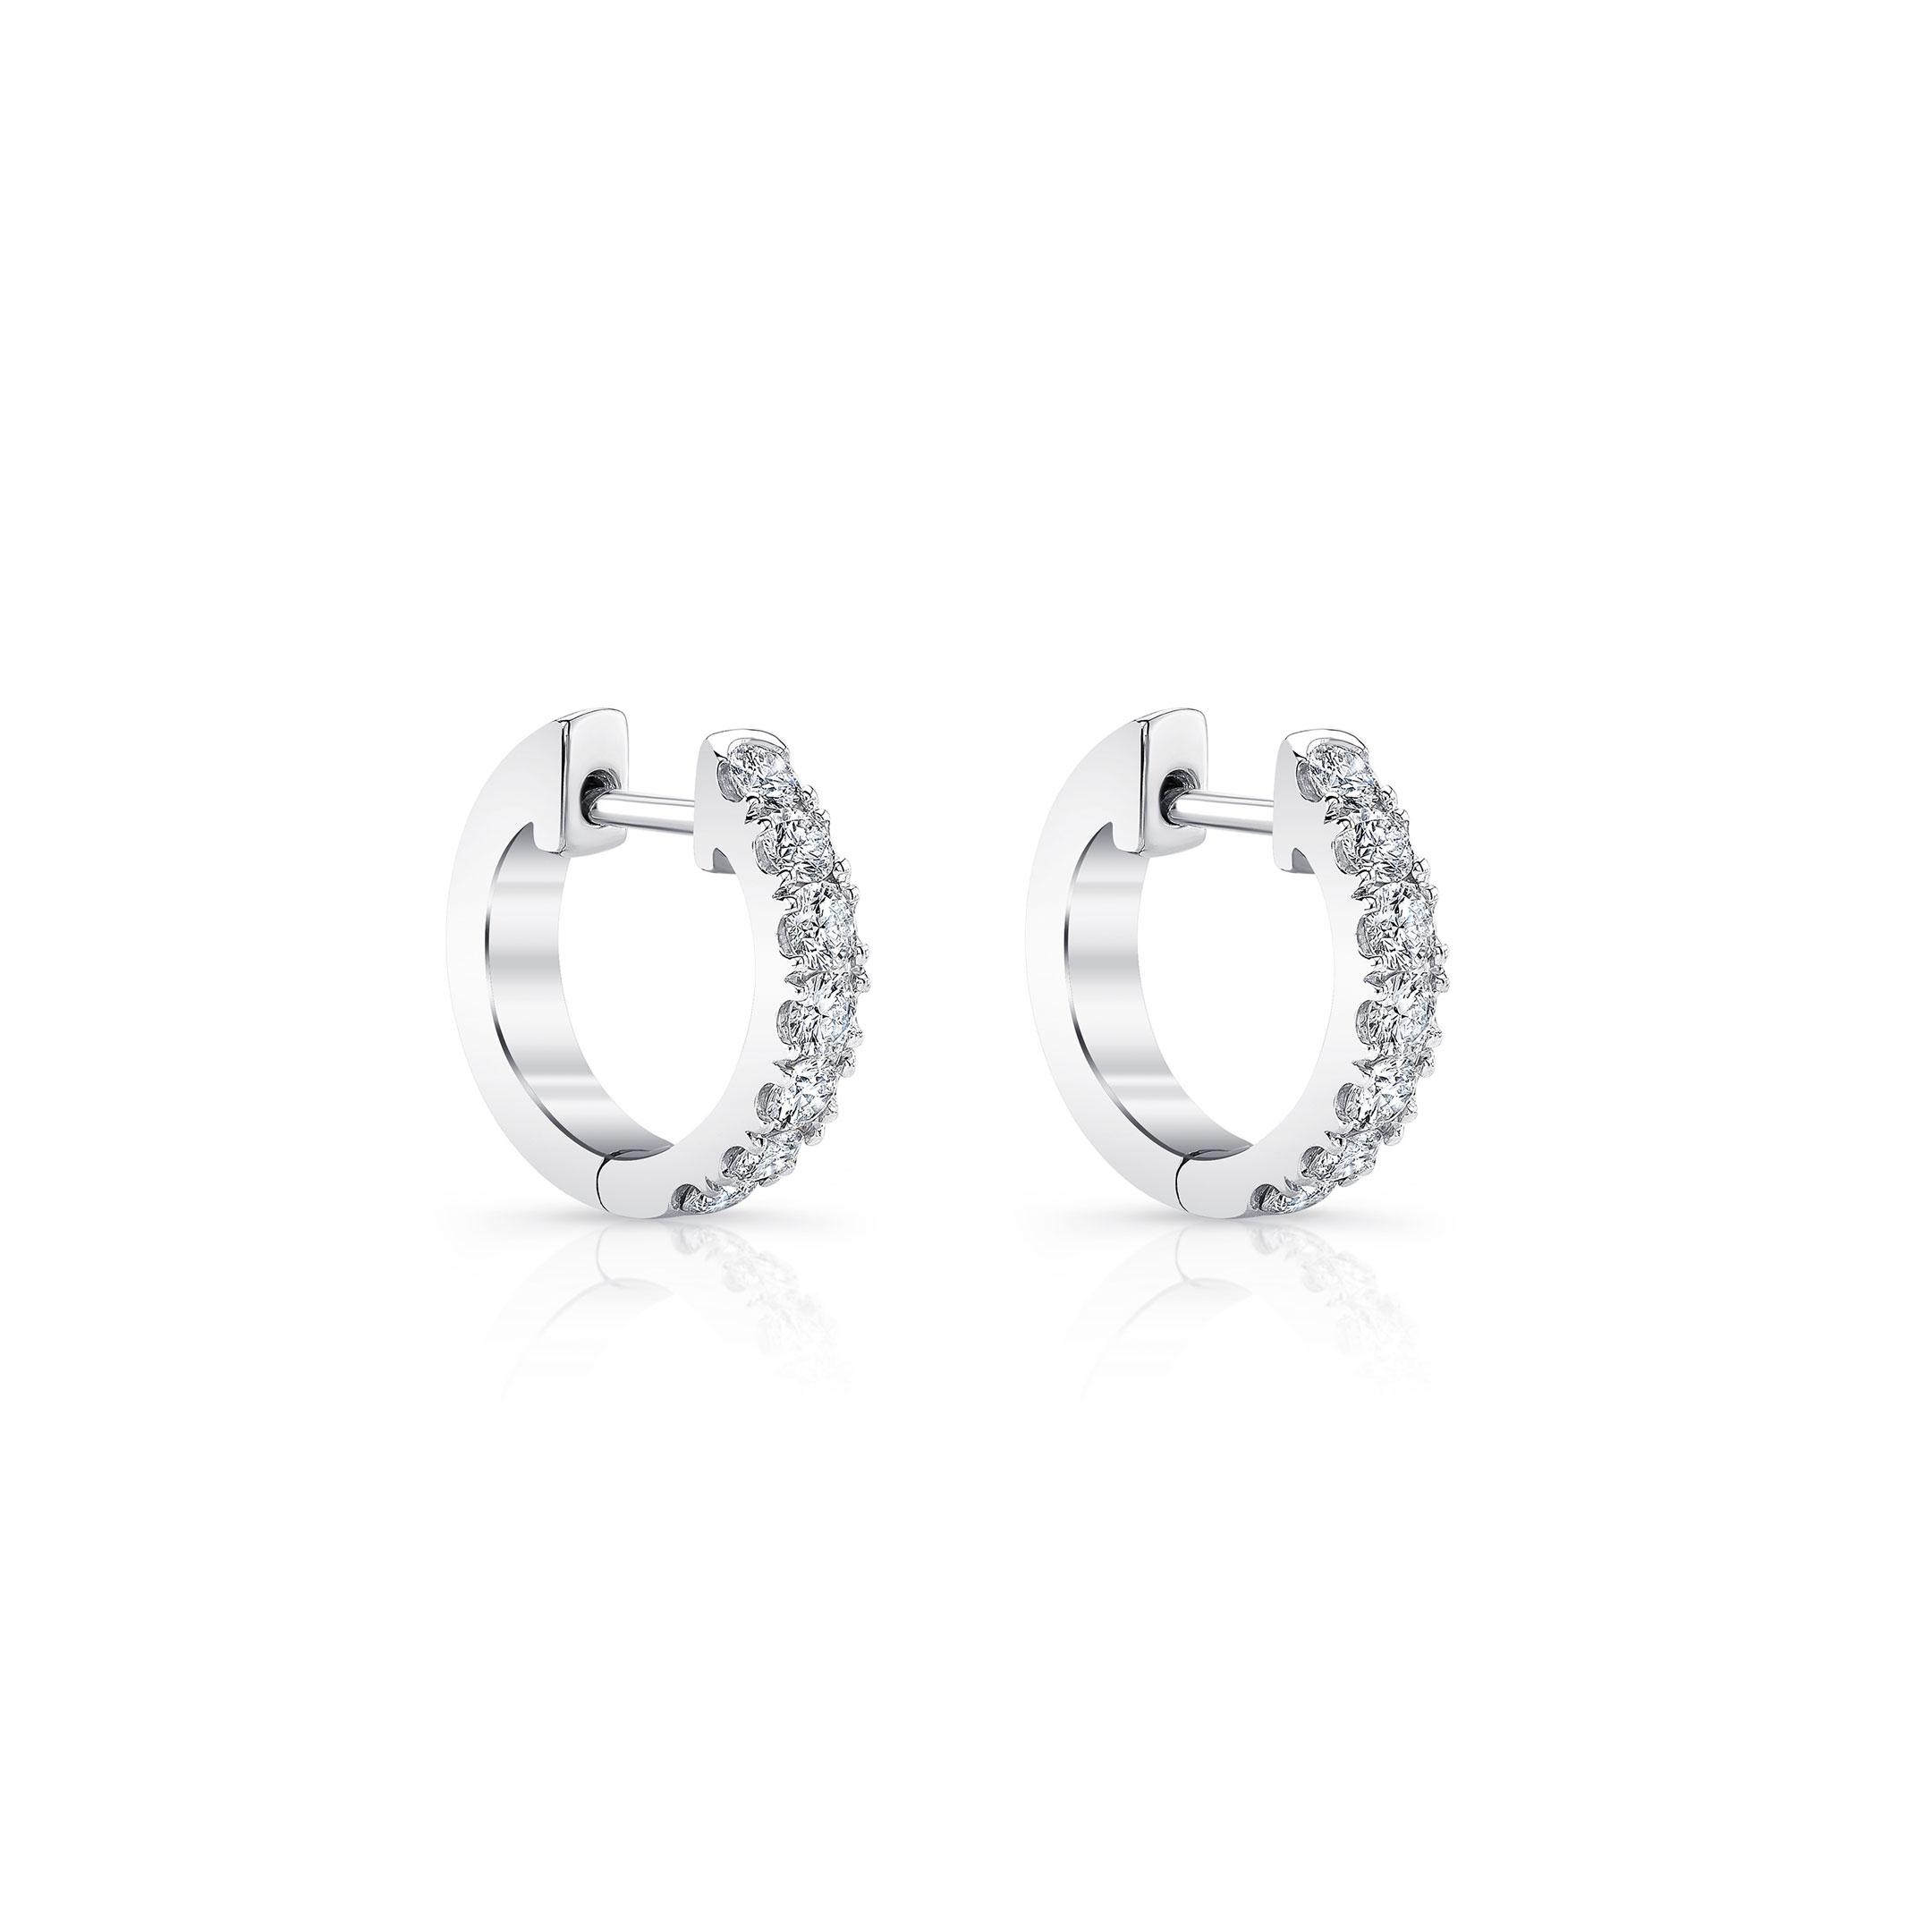 Eloise Mini Round Brilliant Diamond Huggie Earrings in 18k White Gold Side View by Oui by Jean Dousset